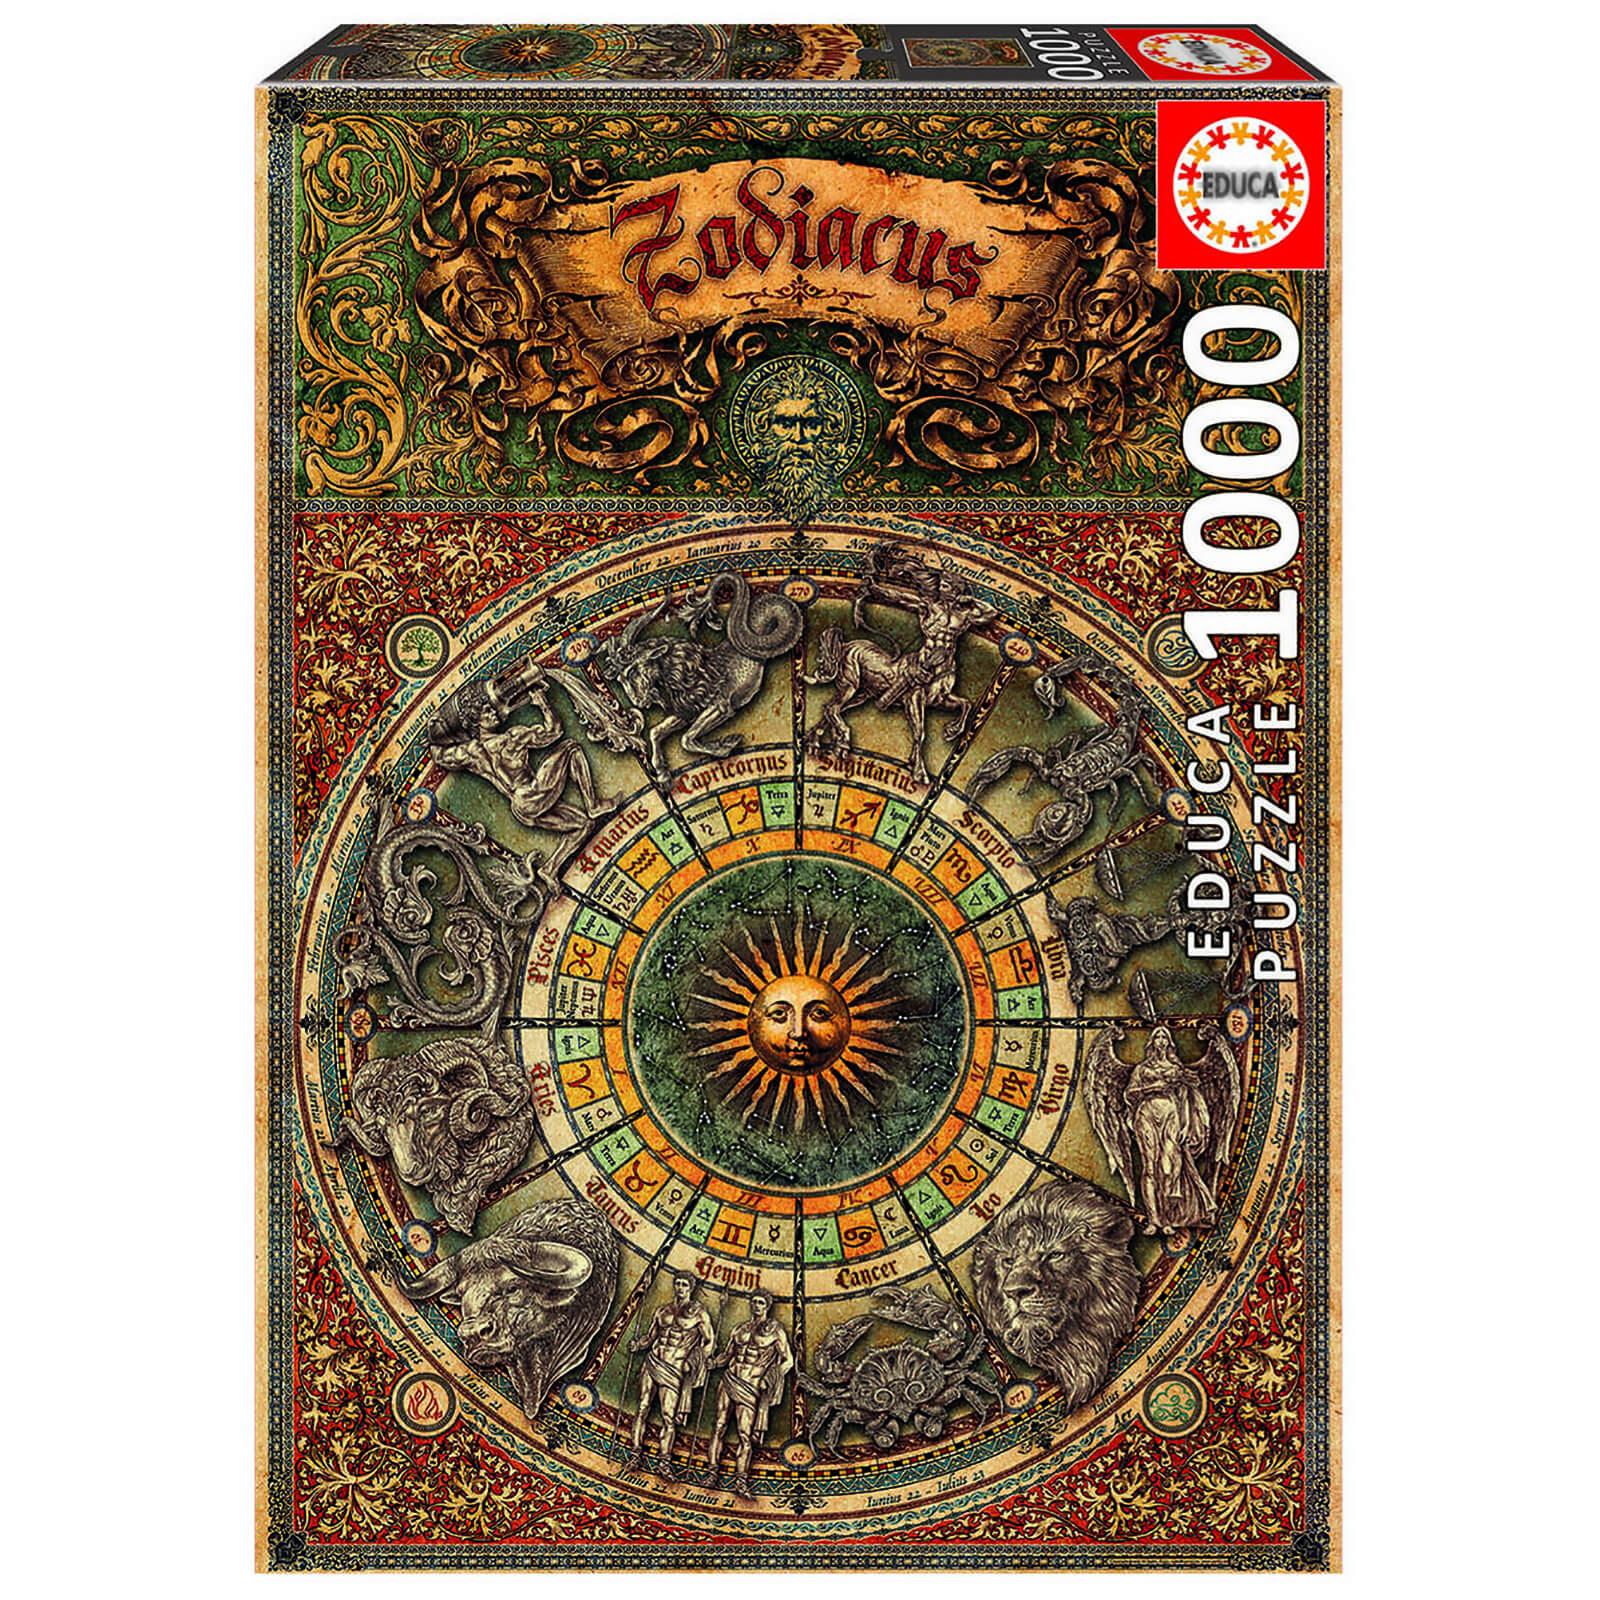 Image of Zodiac Jigsaw Puzzle (1000 Pieces)